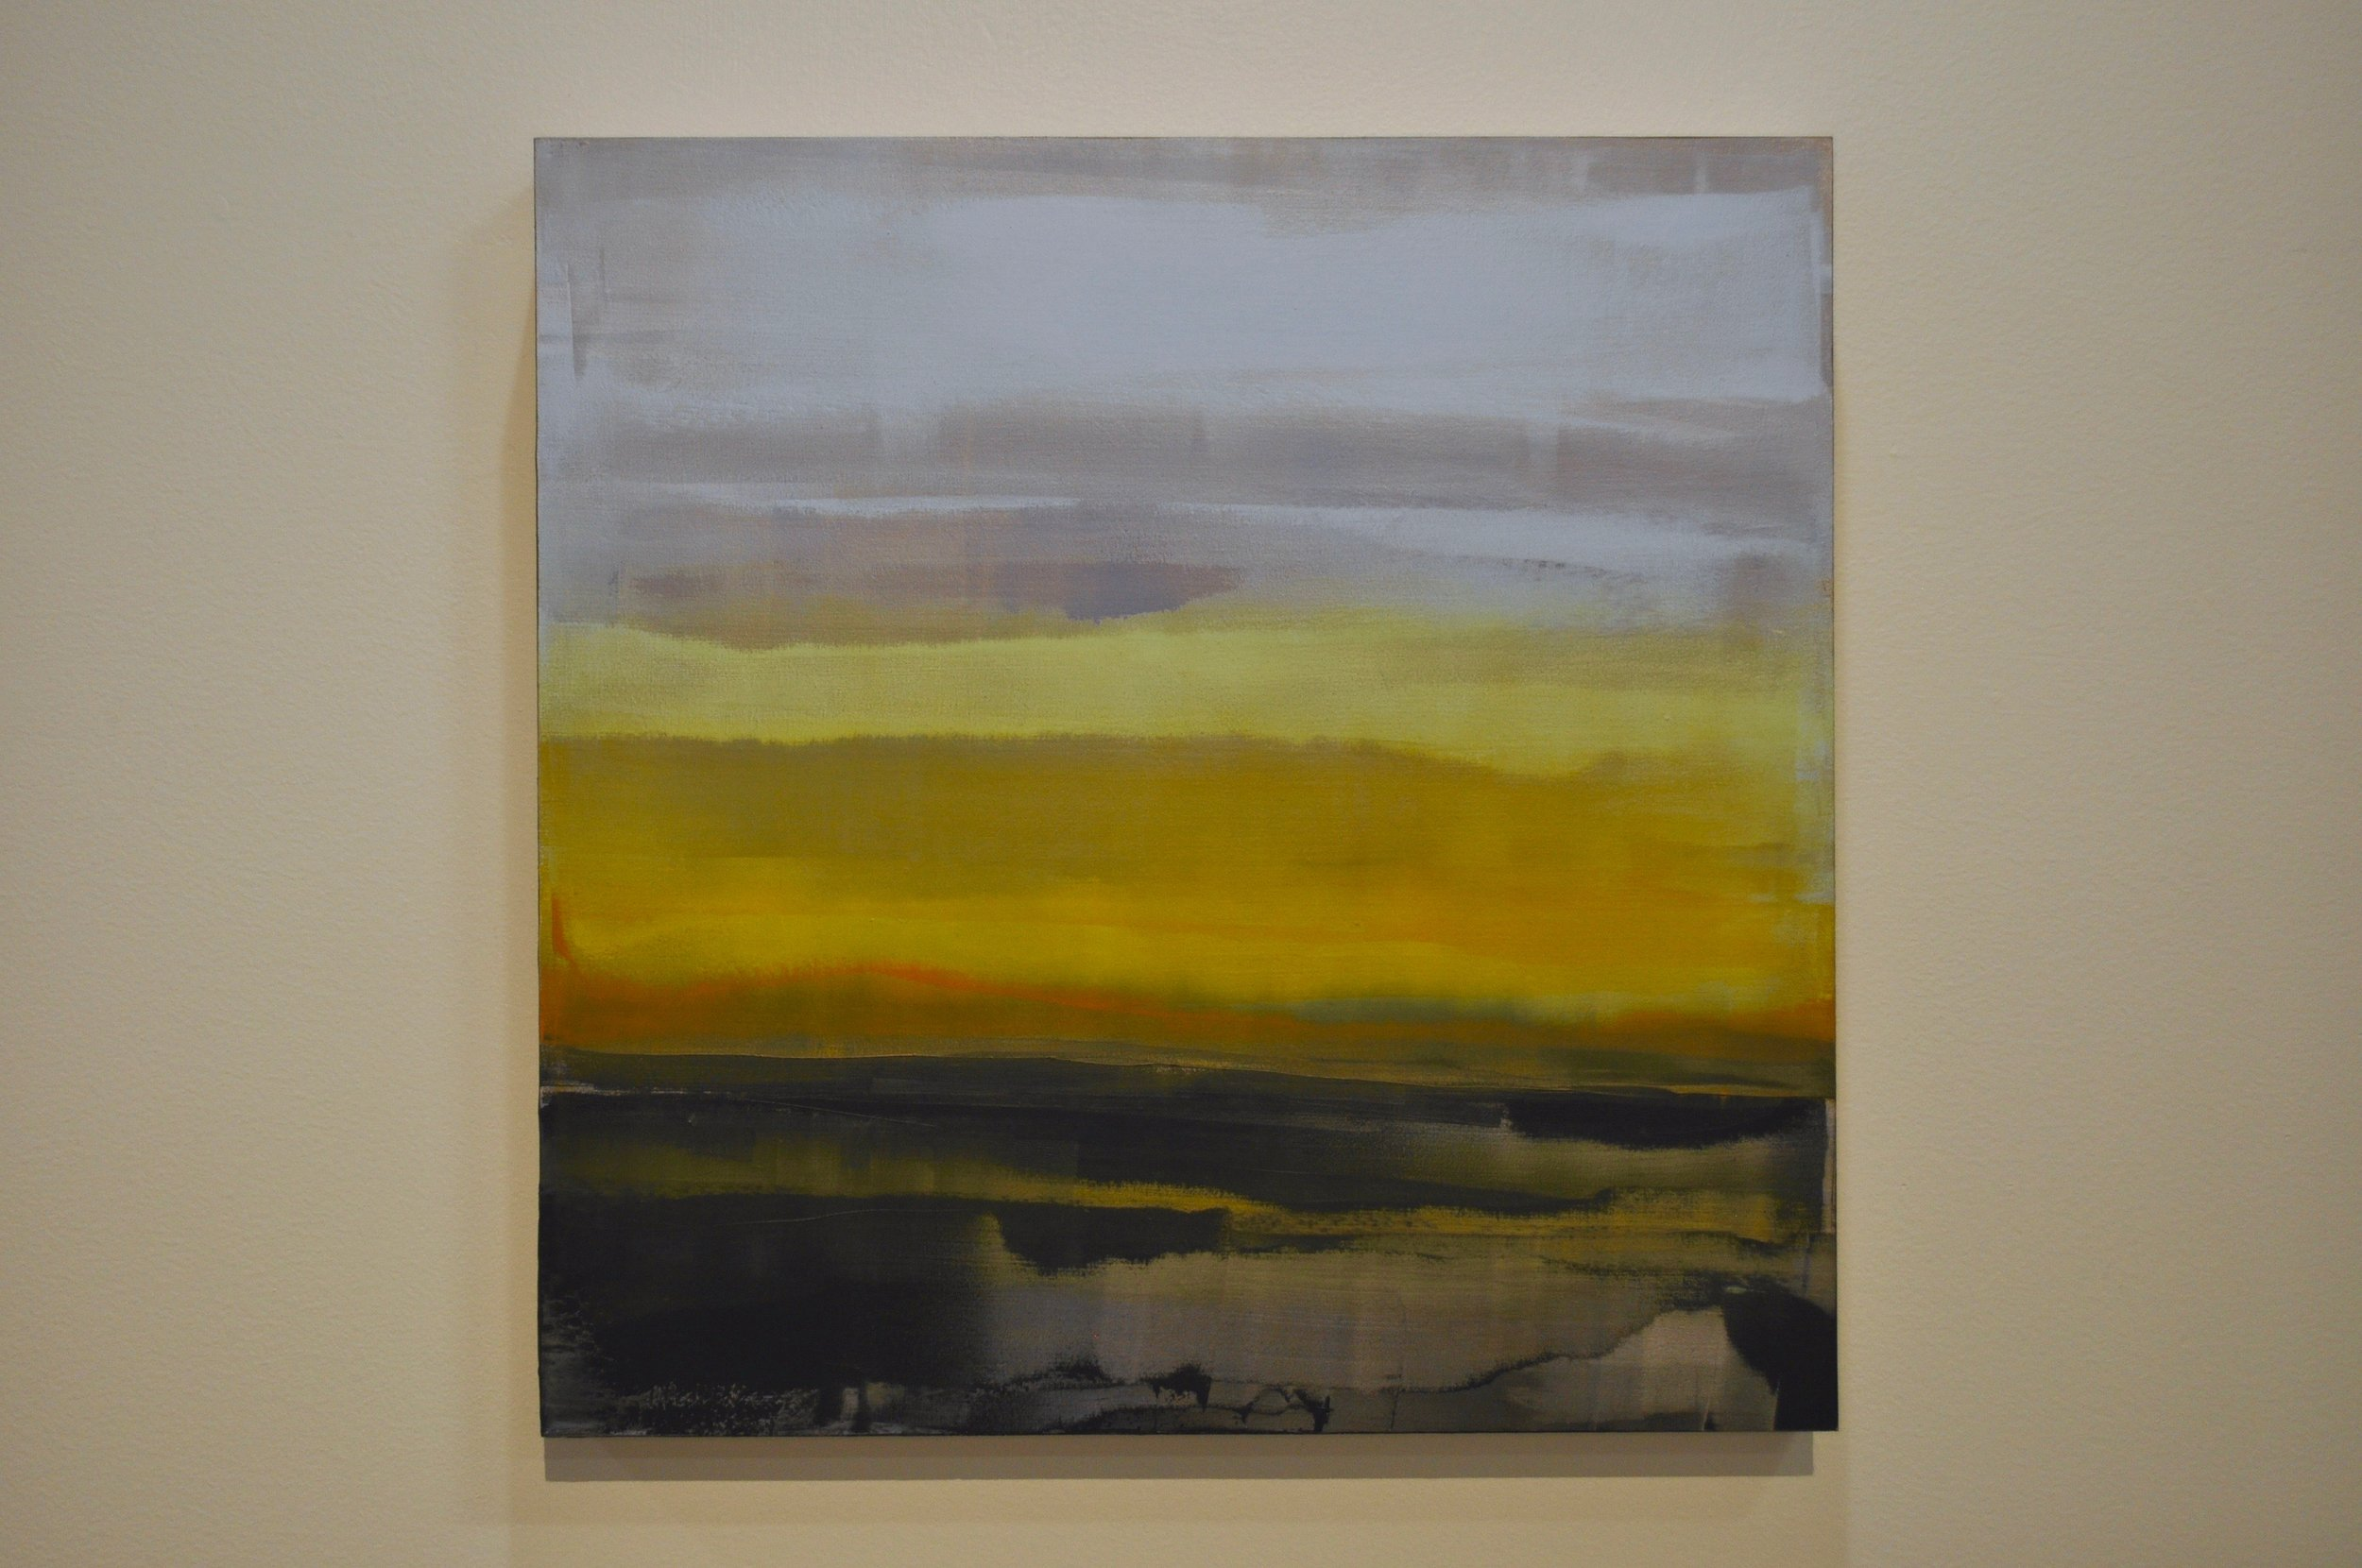 Carol Pelletier, Dawn. Oil and cold wax on birch panel. Caroline McCann photograph